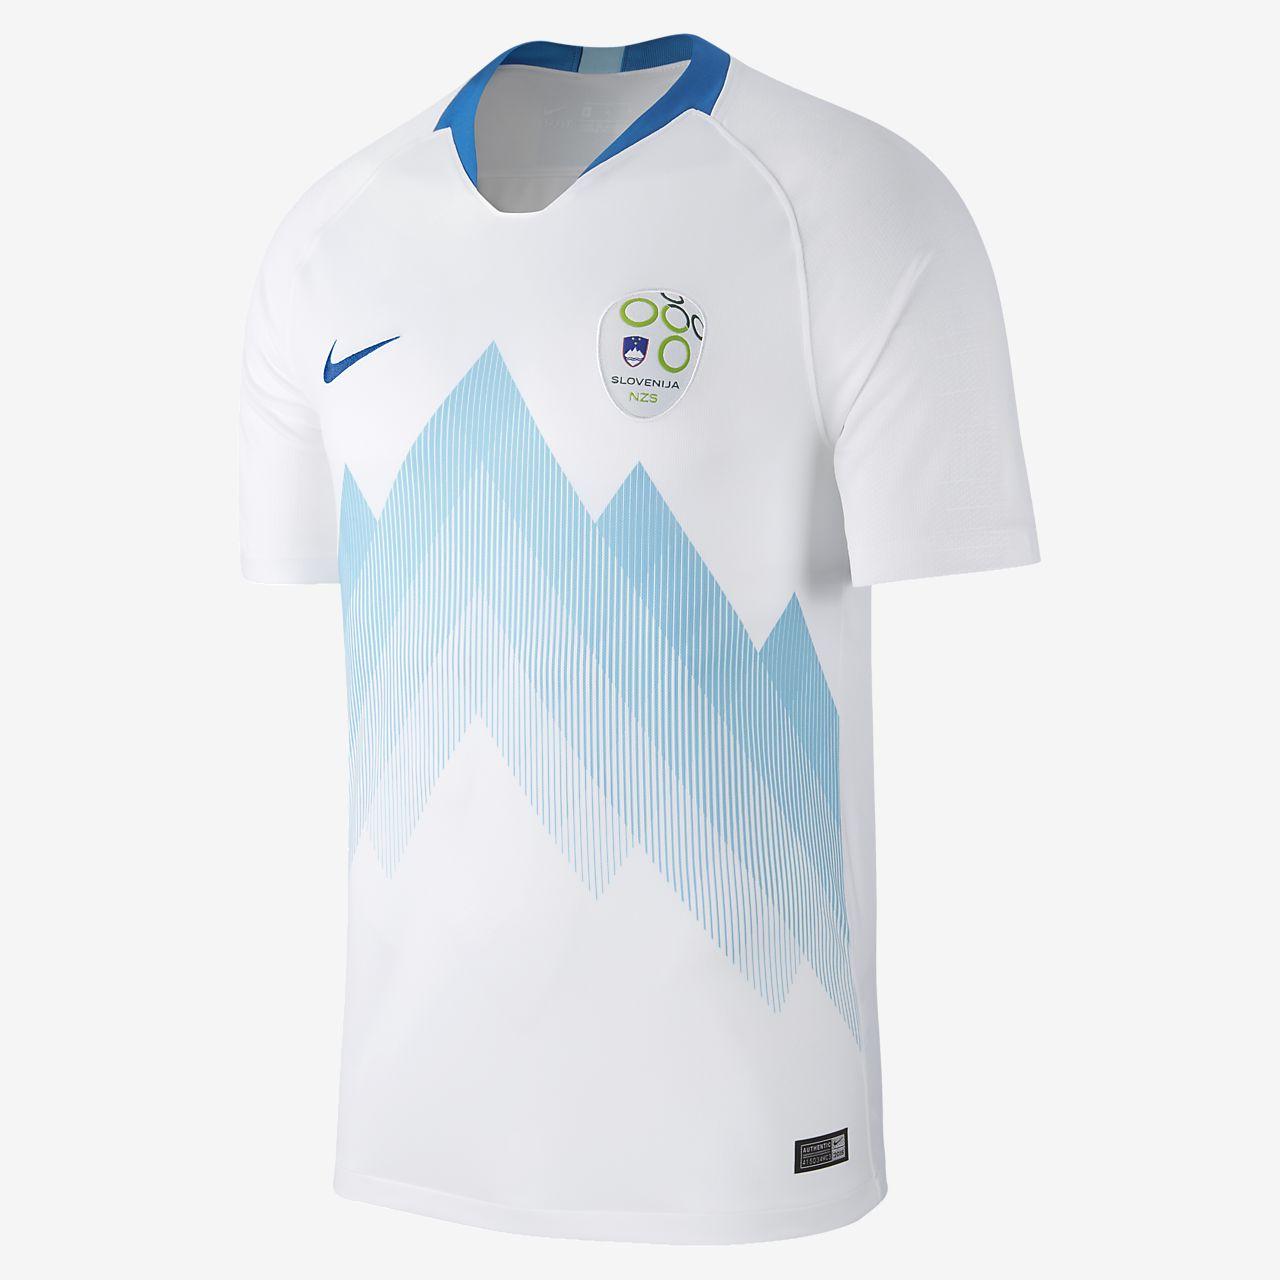 2018 Slovenia Stadium Home Men's Football Shirt